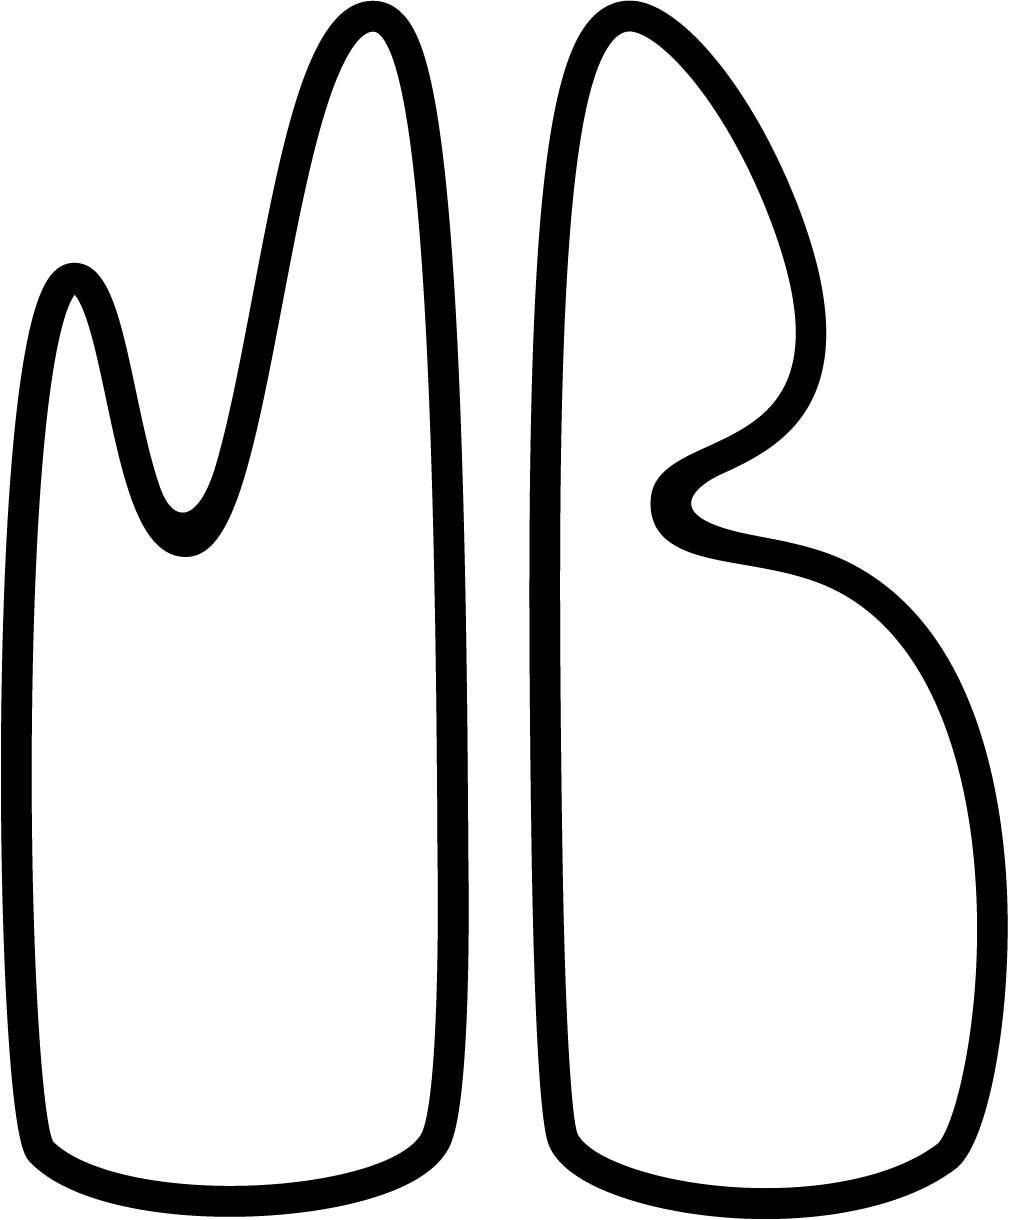 mykal baytaluk